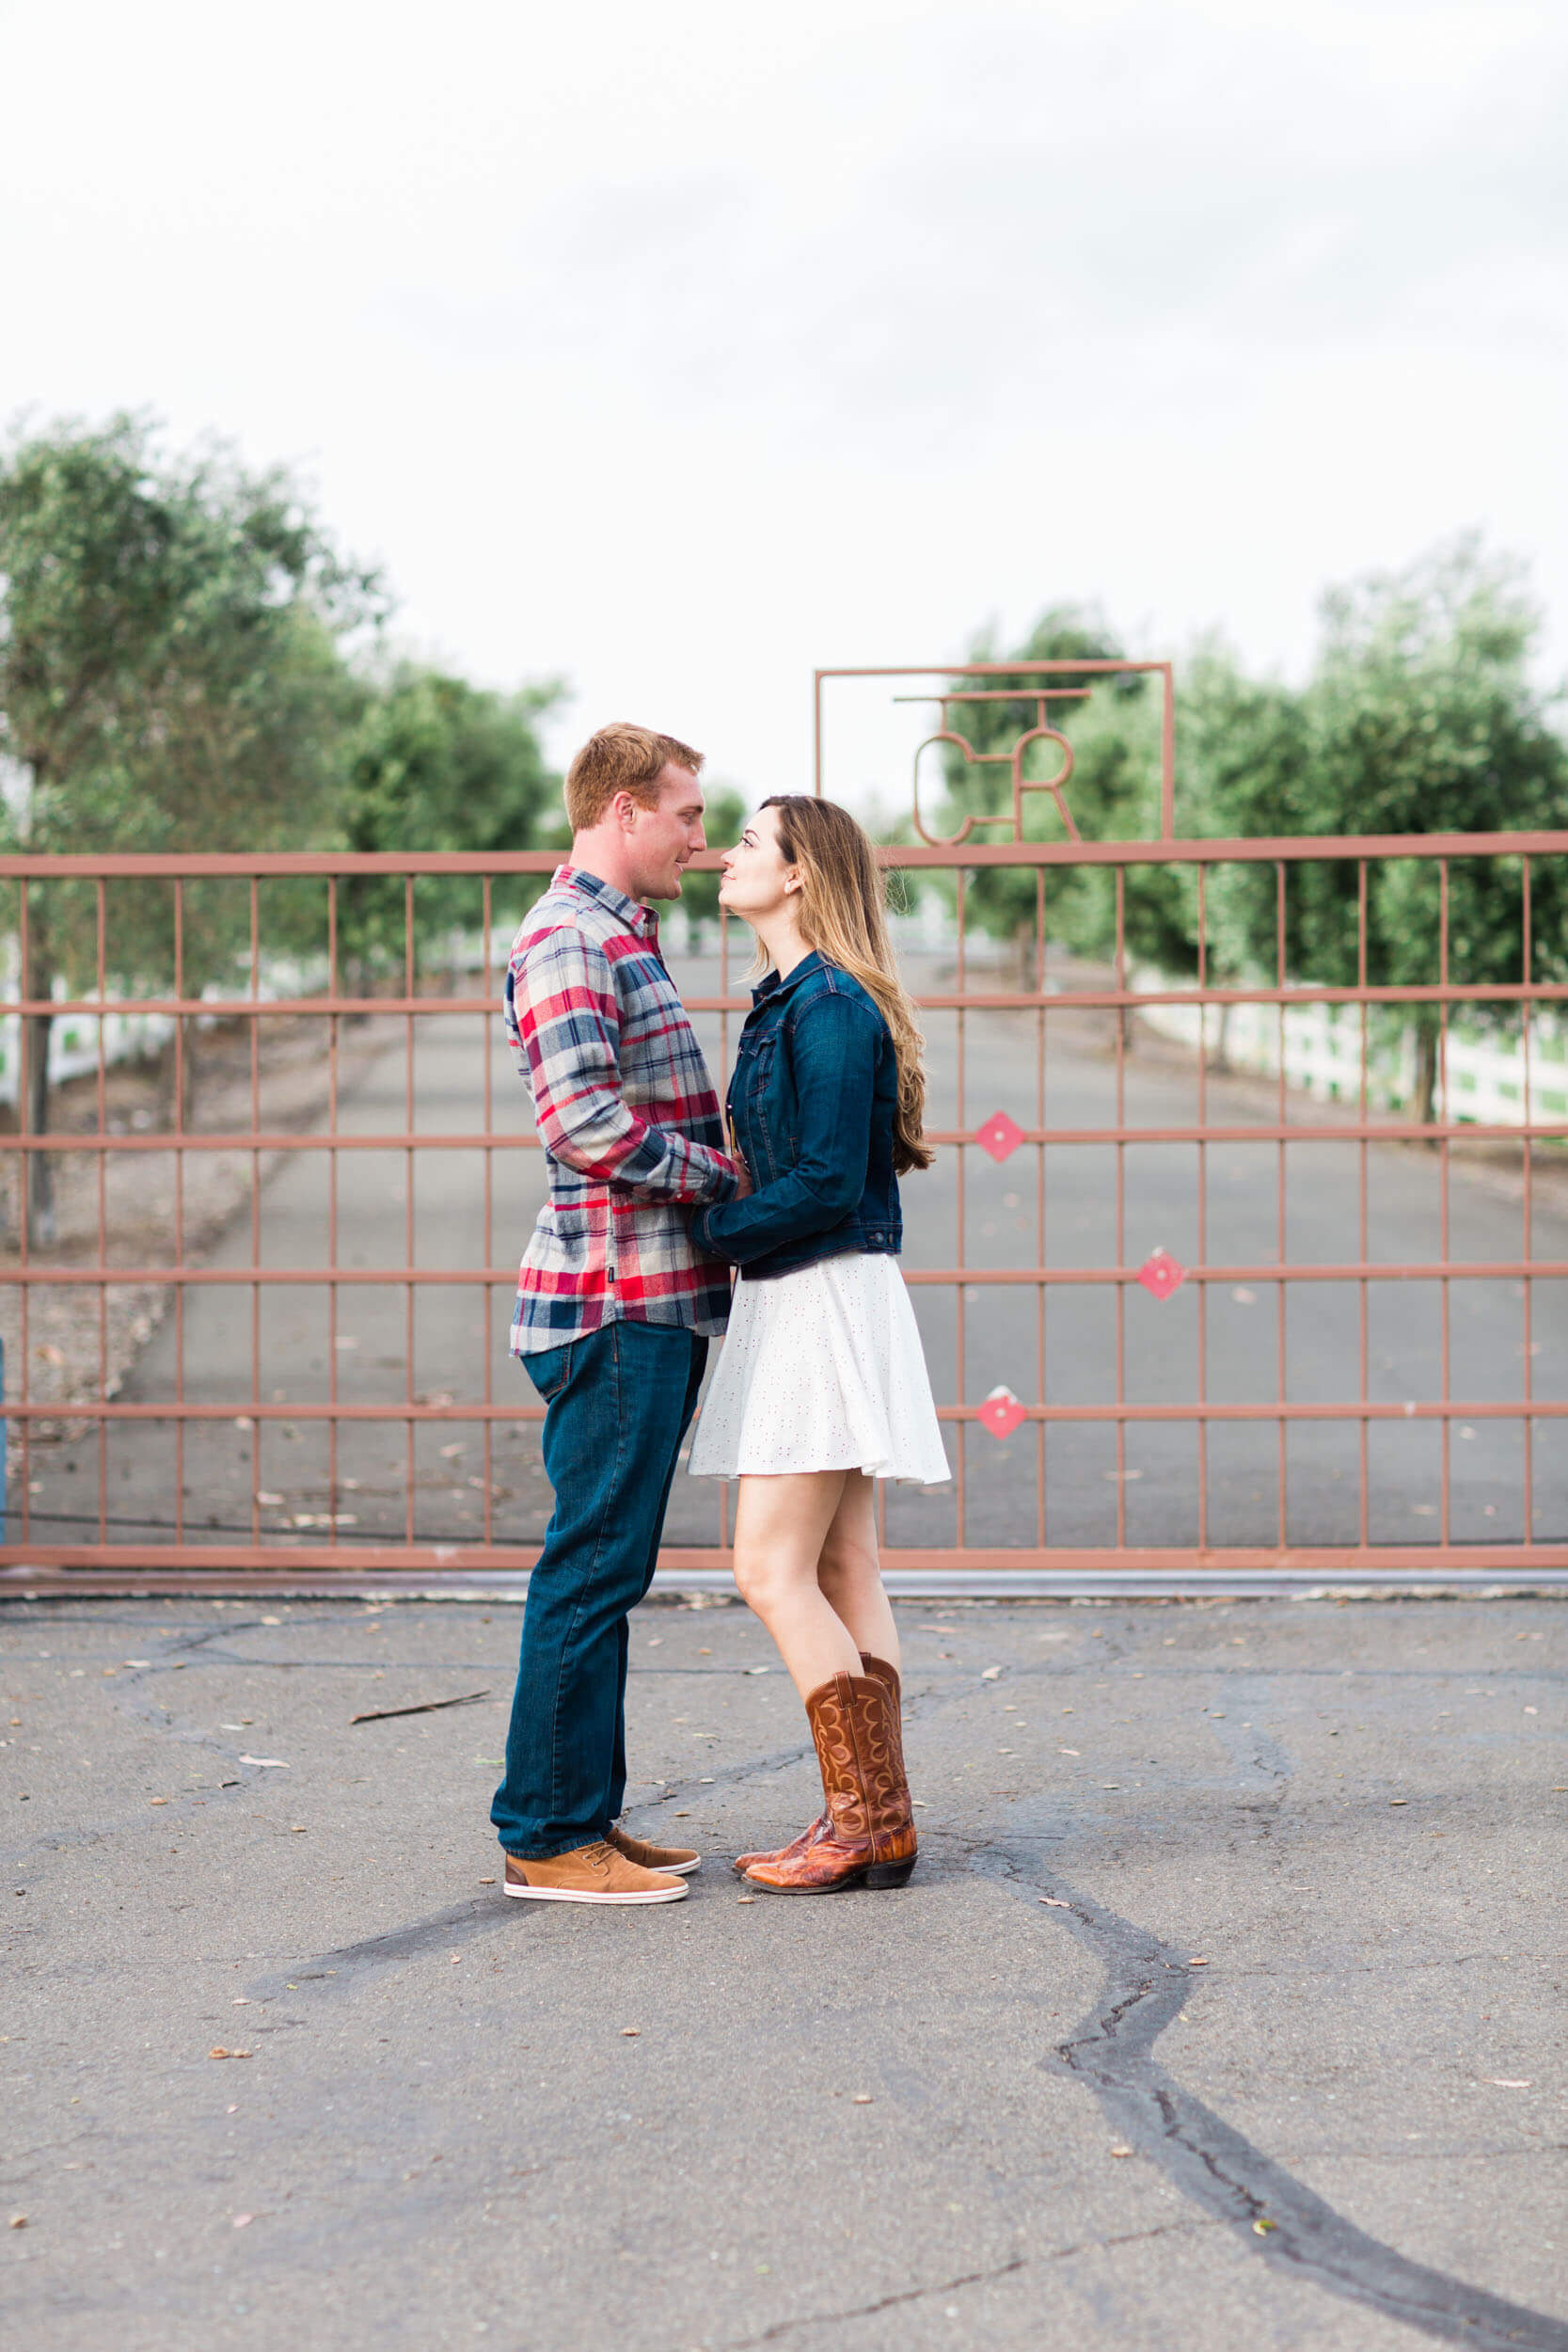 Laid back san francisco engagement session - best San Francisco wedding photographer - Claire Dobson